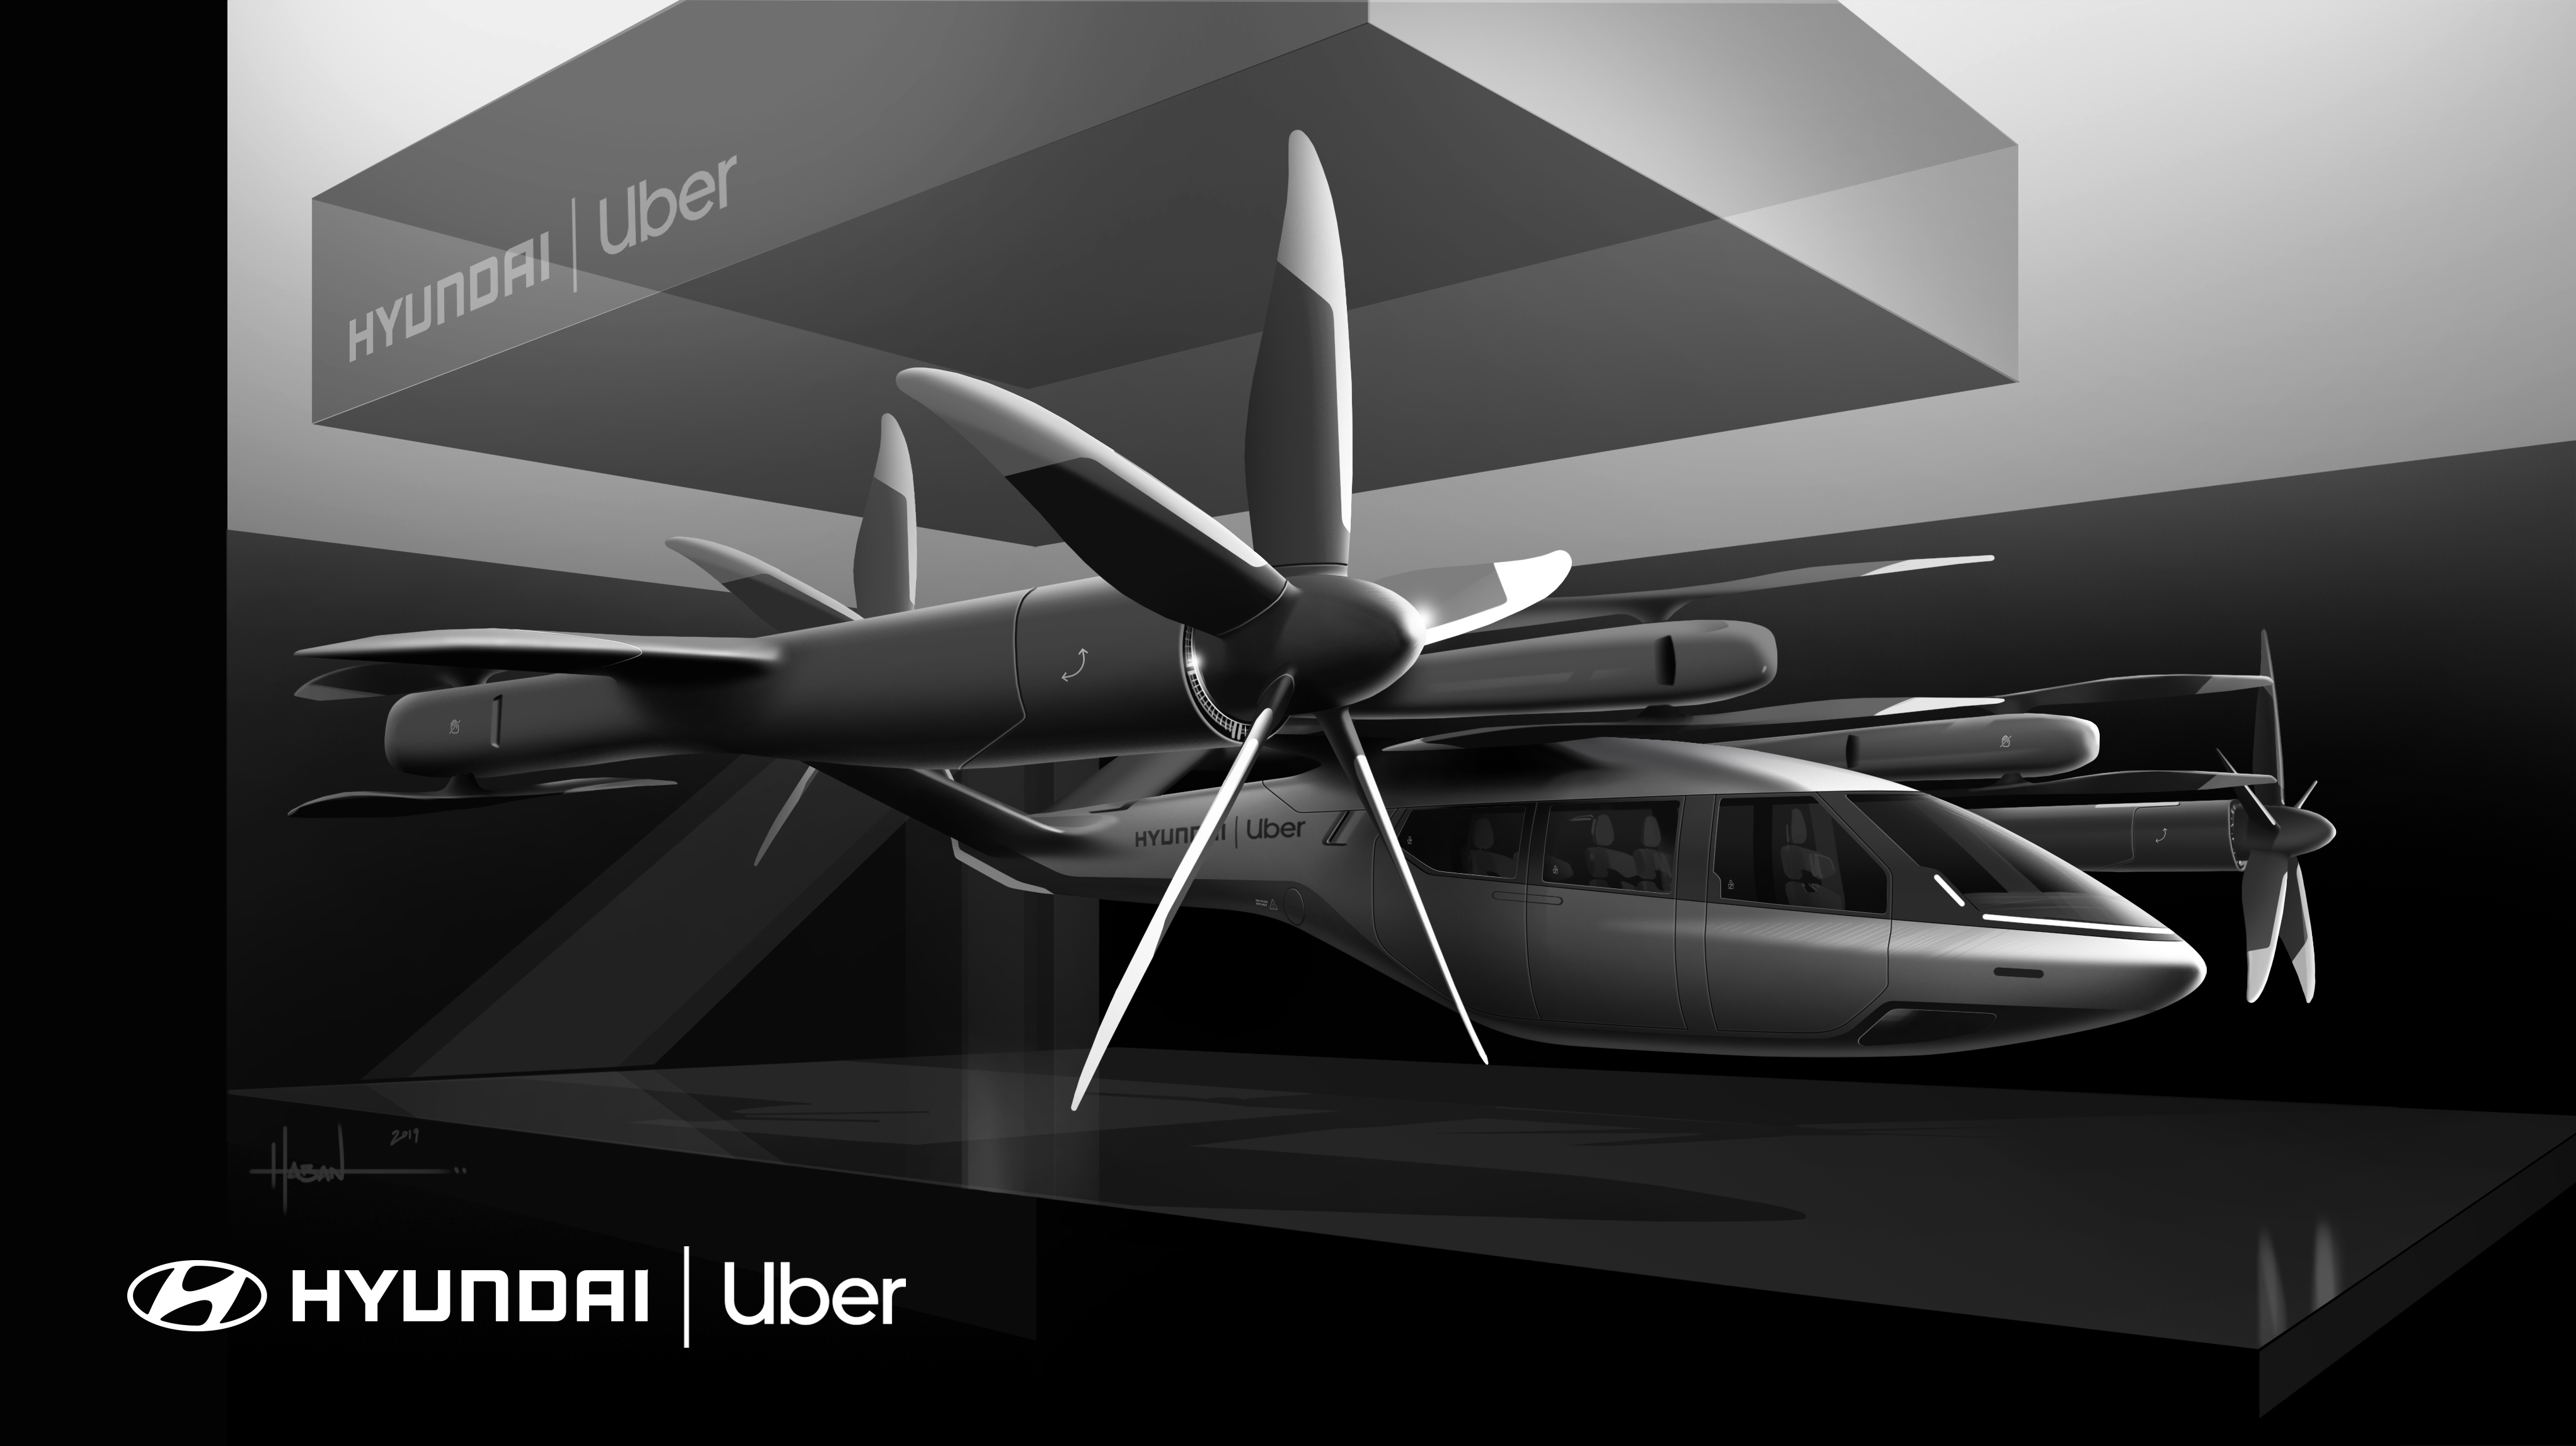 Hyundai, Uber Announce Air Taxi Partnership